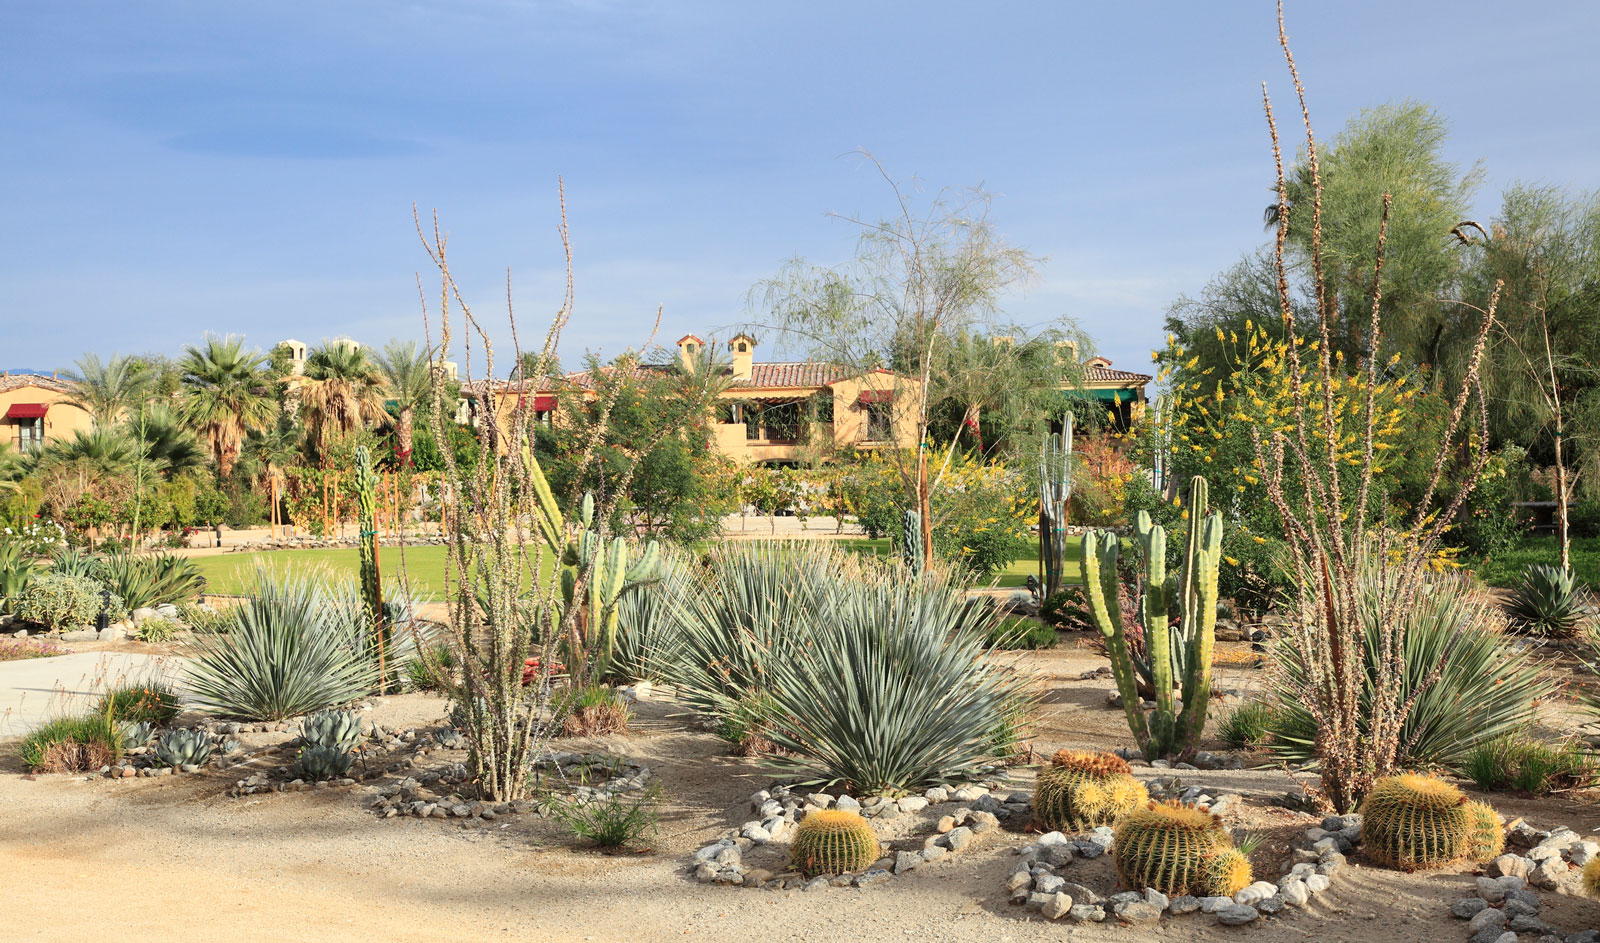 Wüstengarten in Palm Springs (USA)